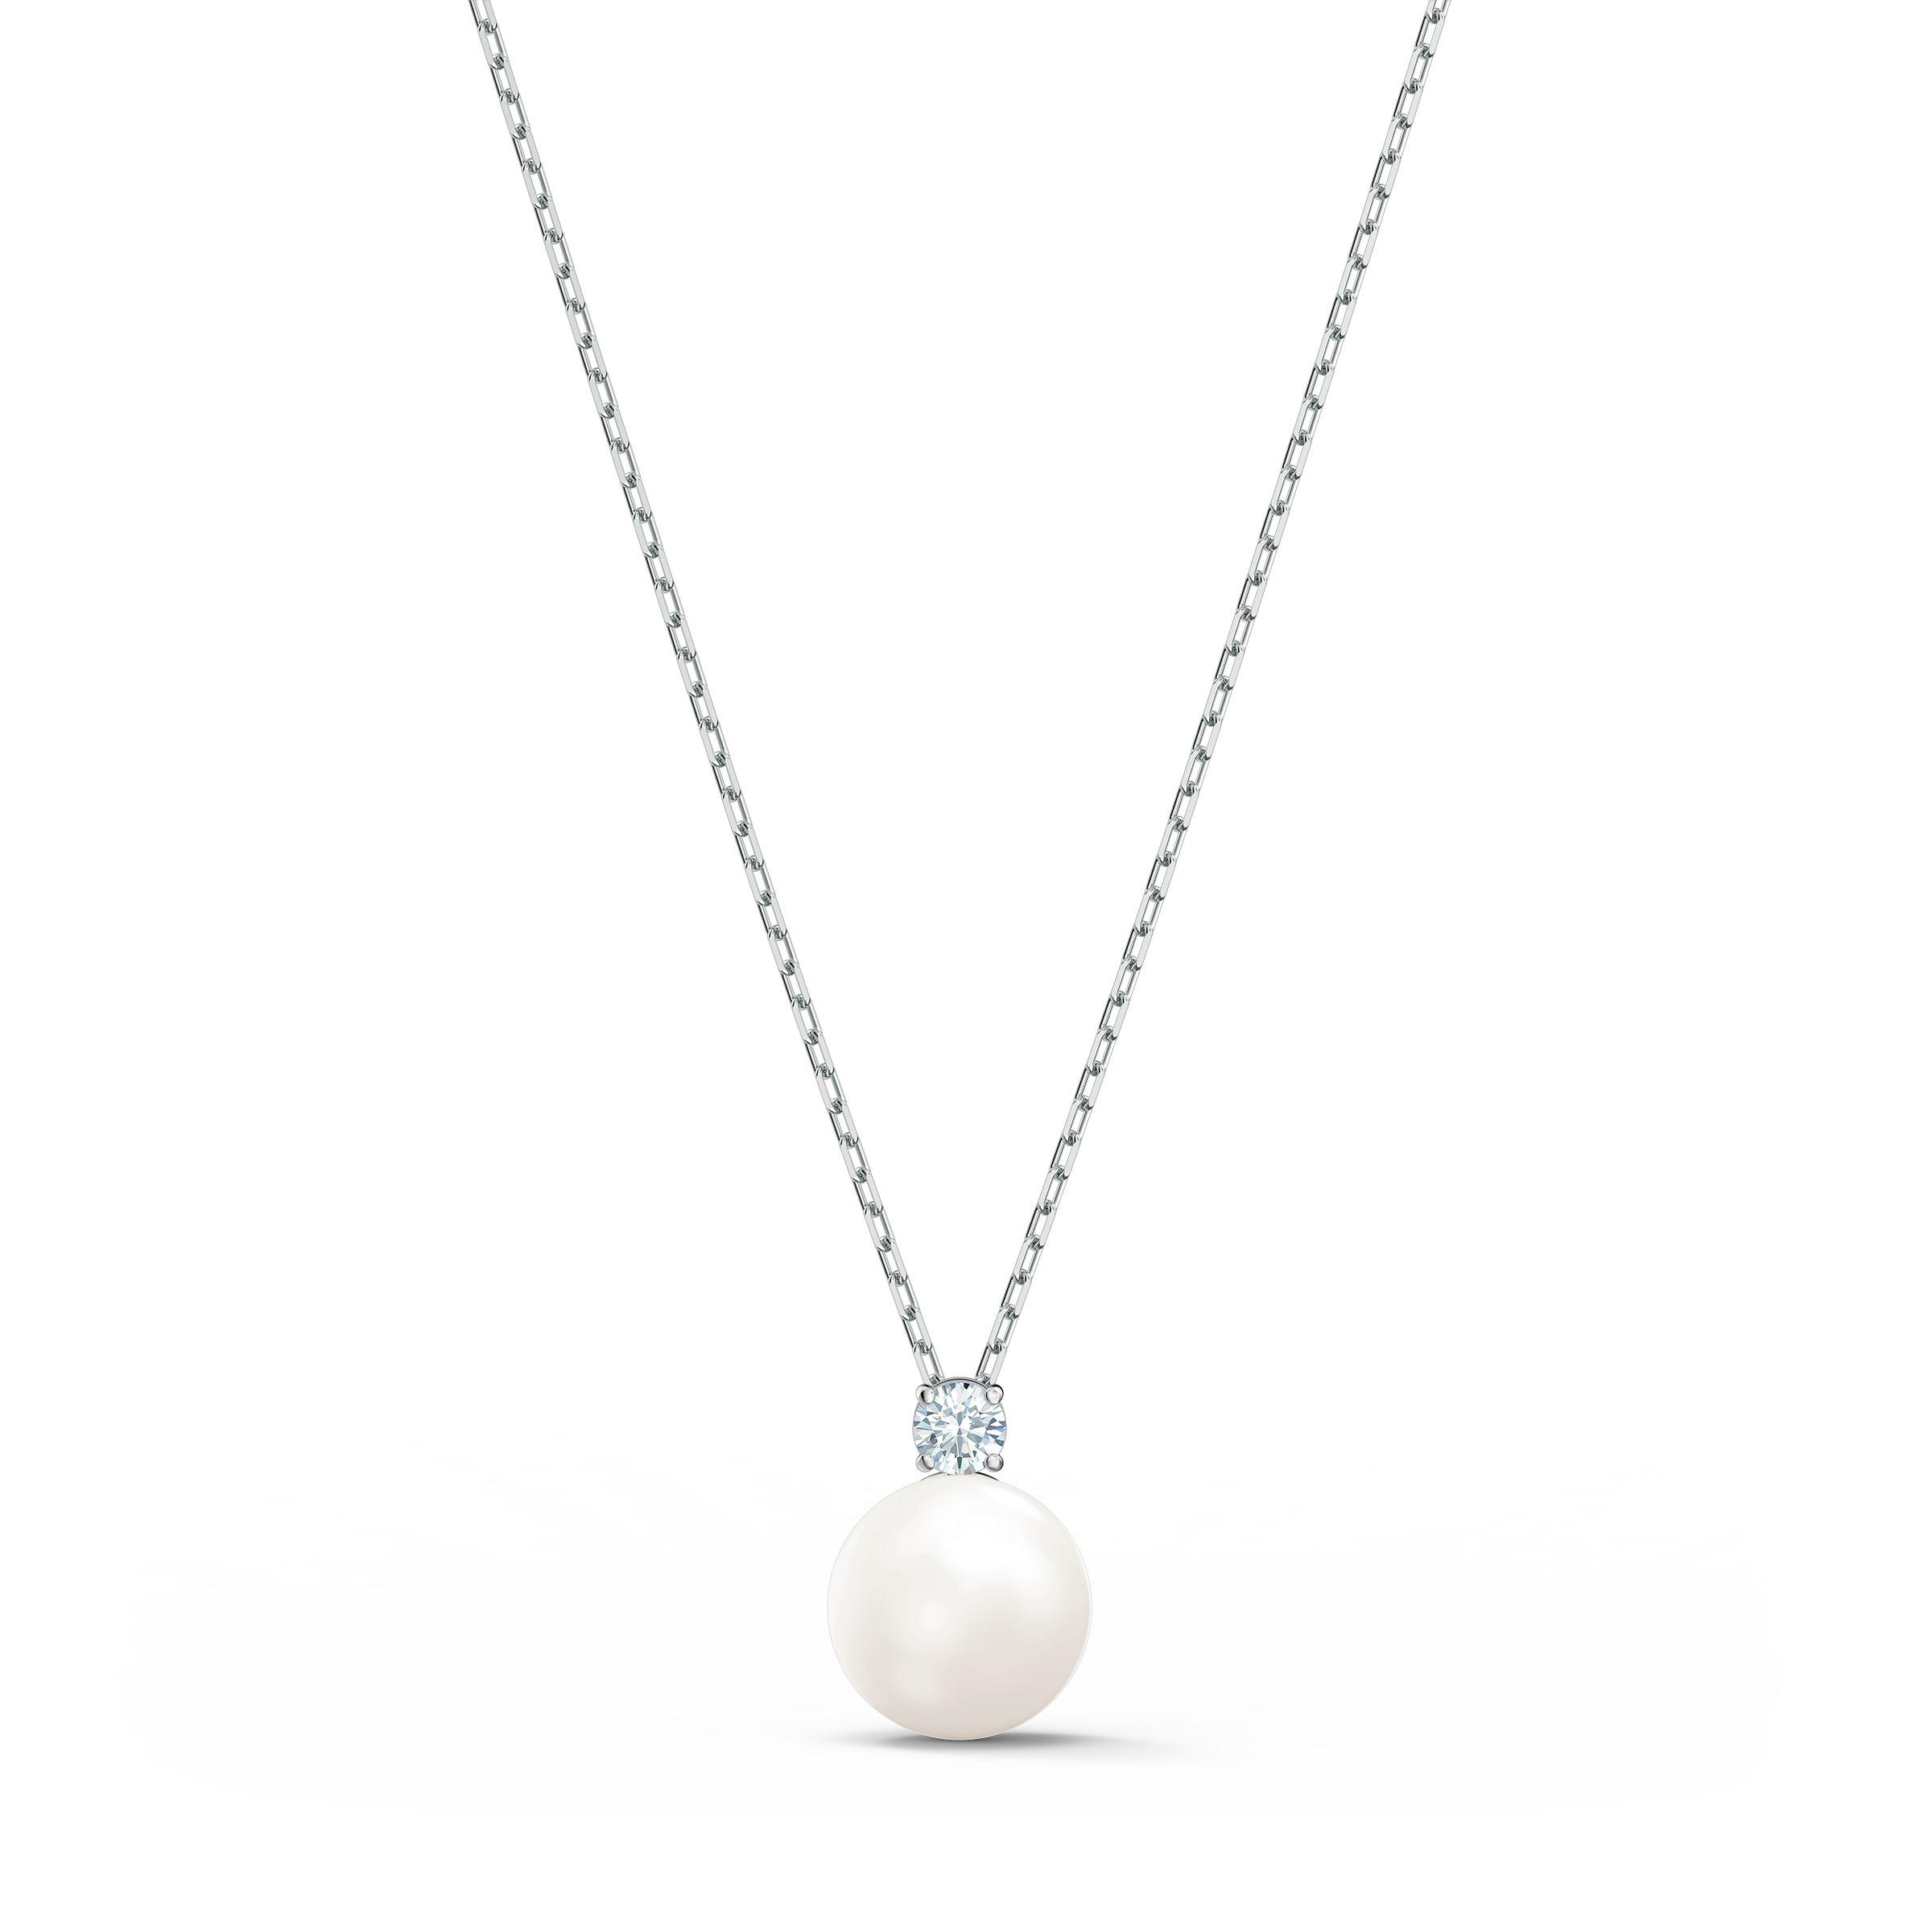 Collier Treasure Pearl, blanc, métal rhodié, Swarovski